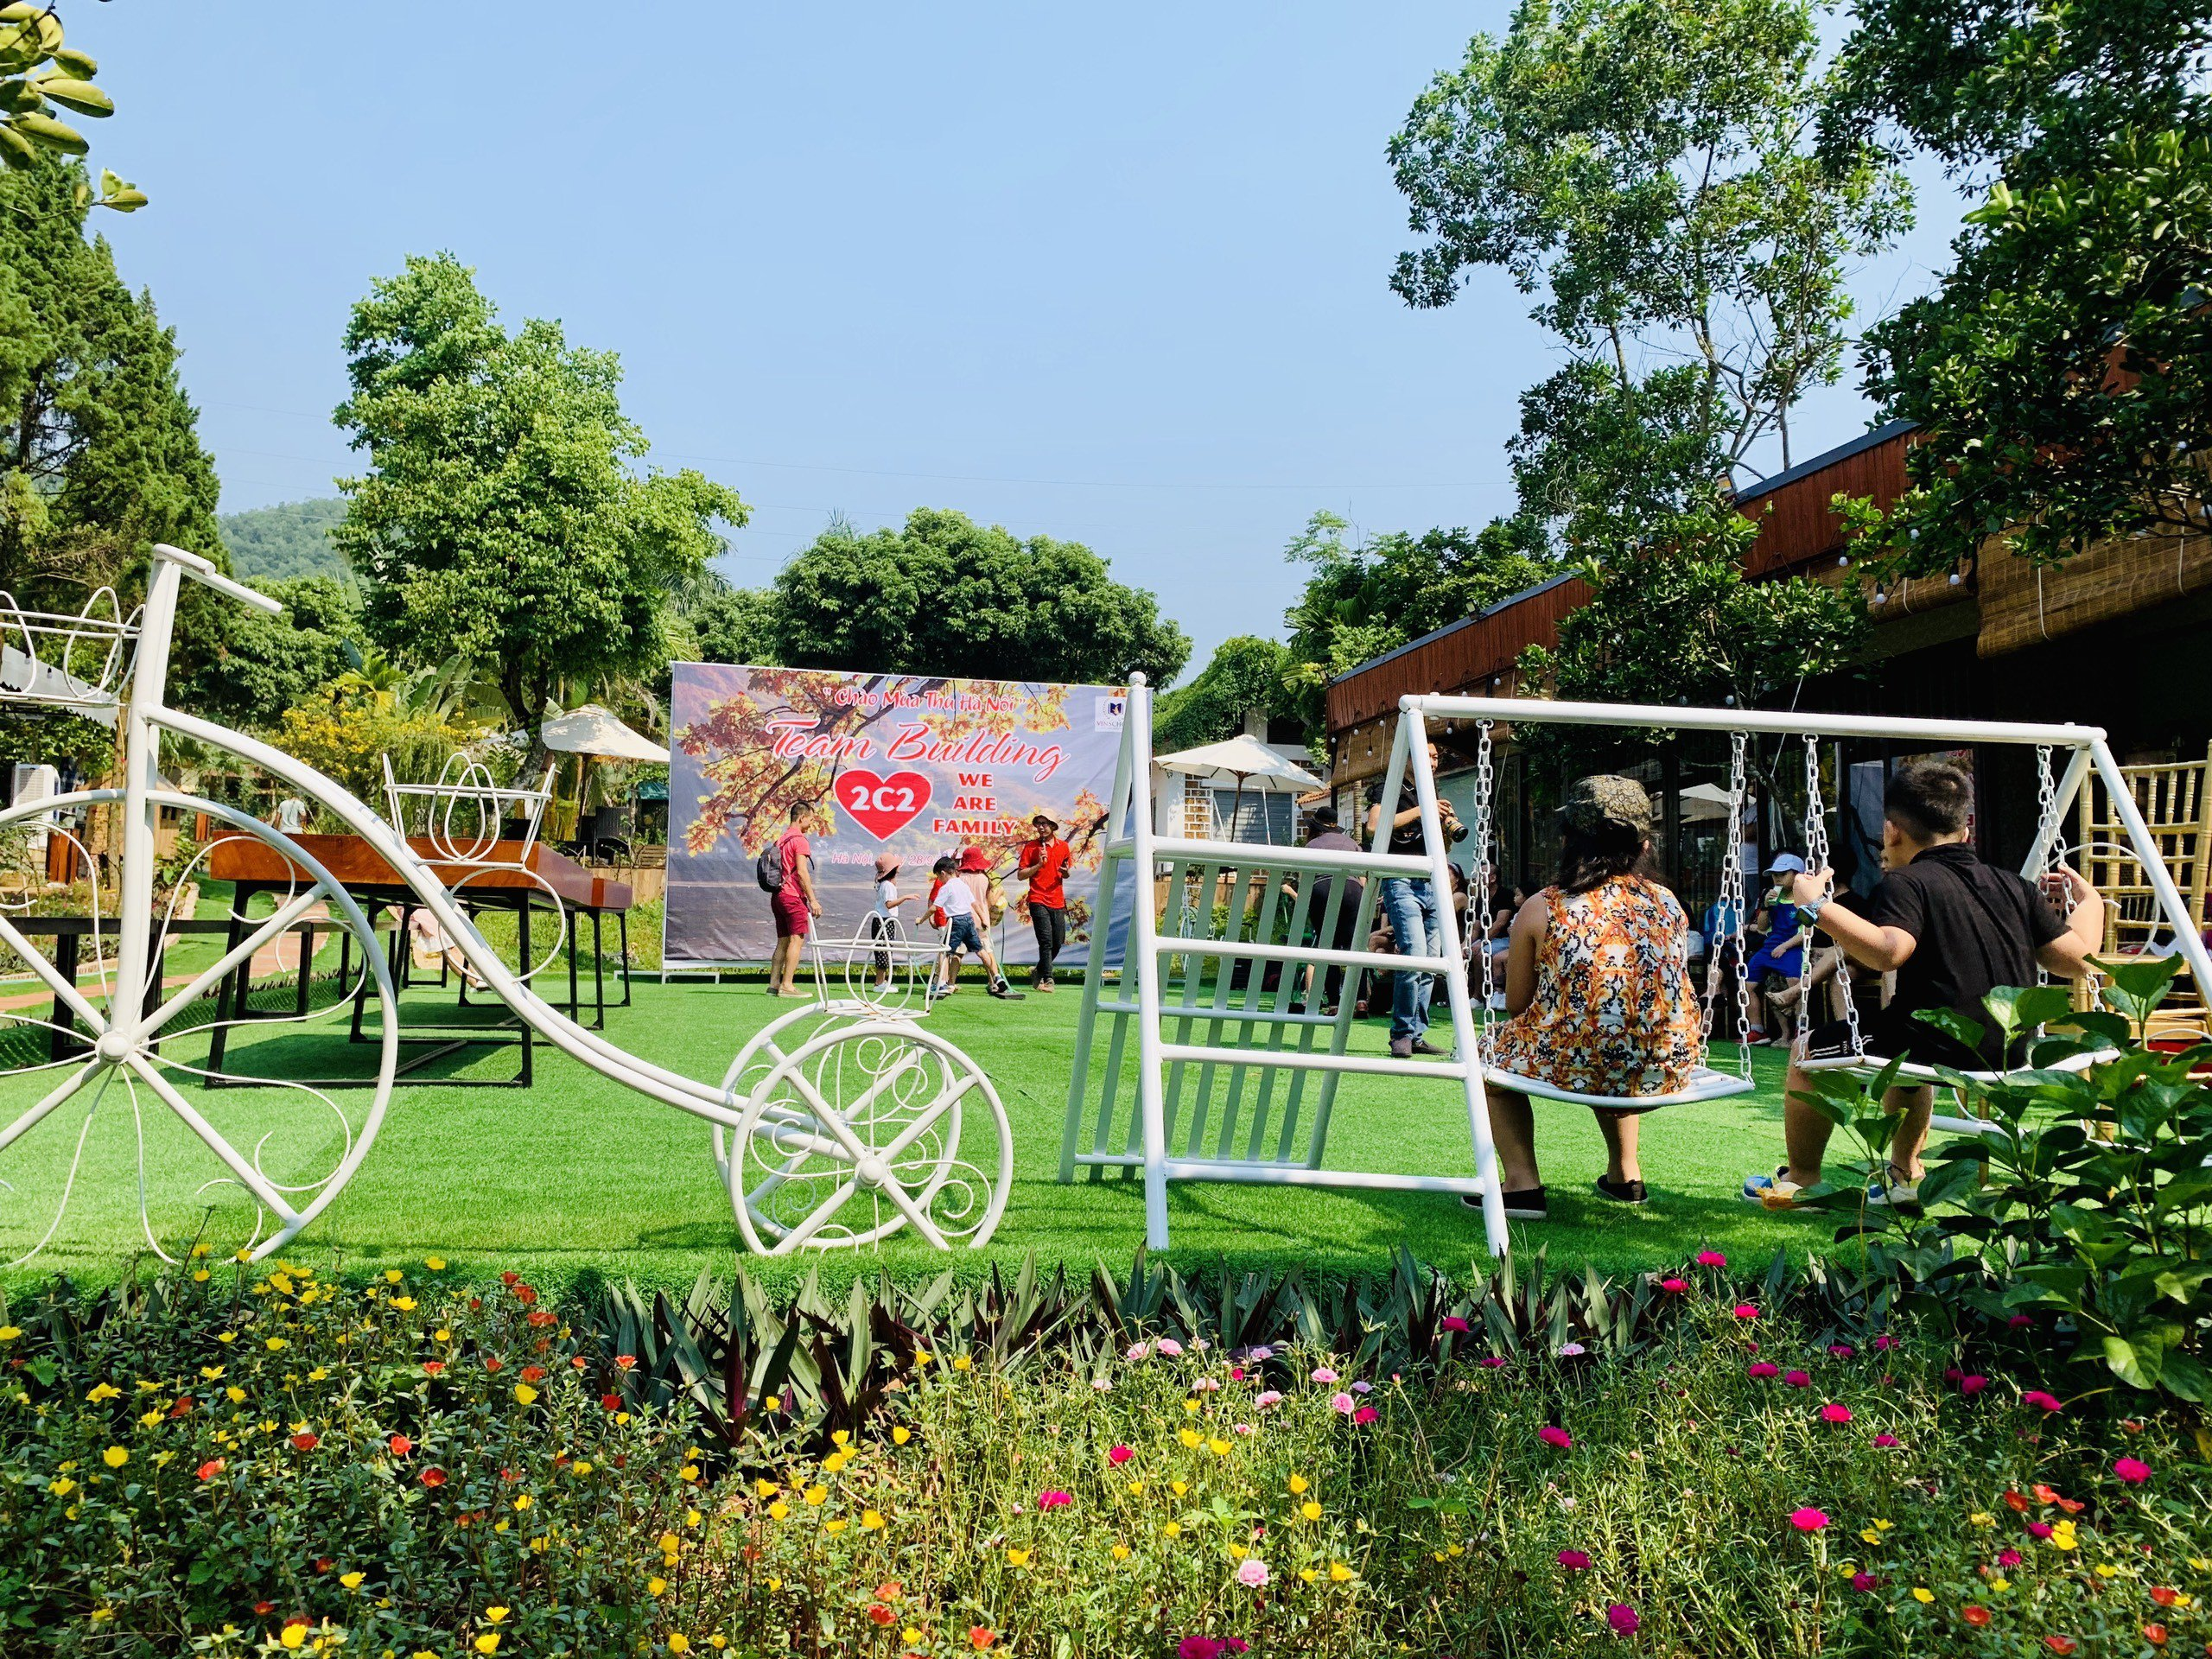 khuon vien sun an garden retreat homestay thach that ha noi